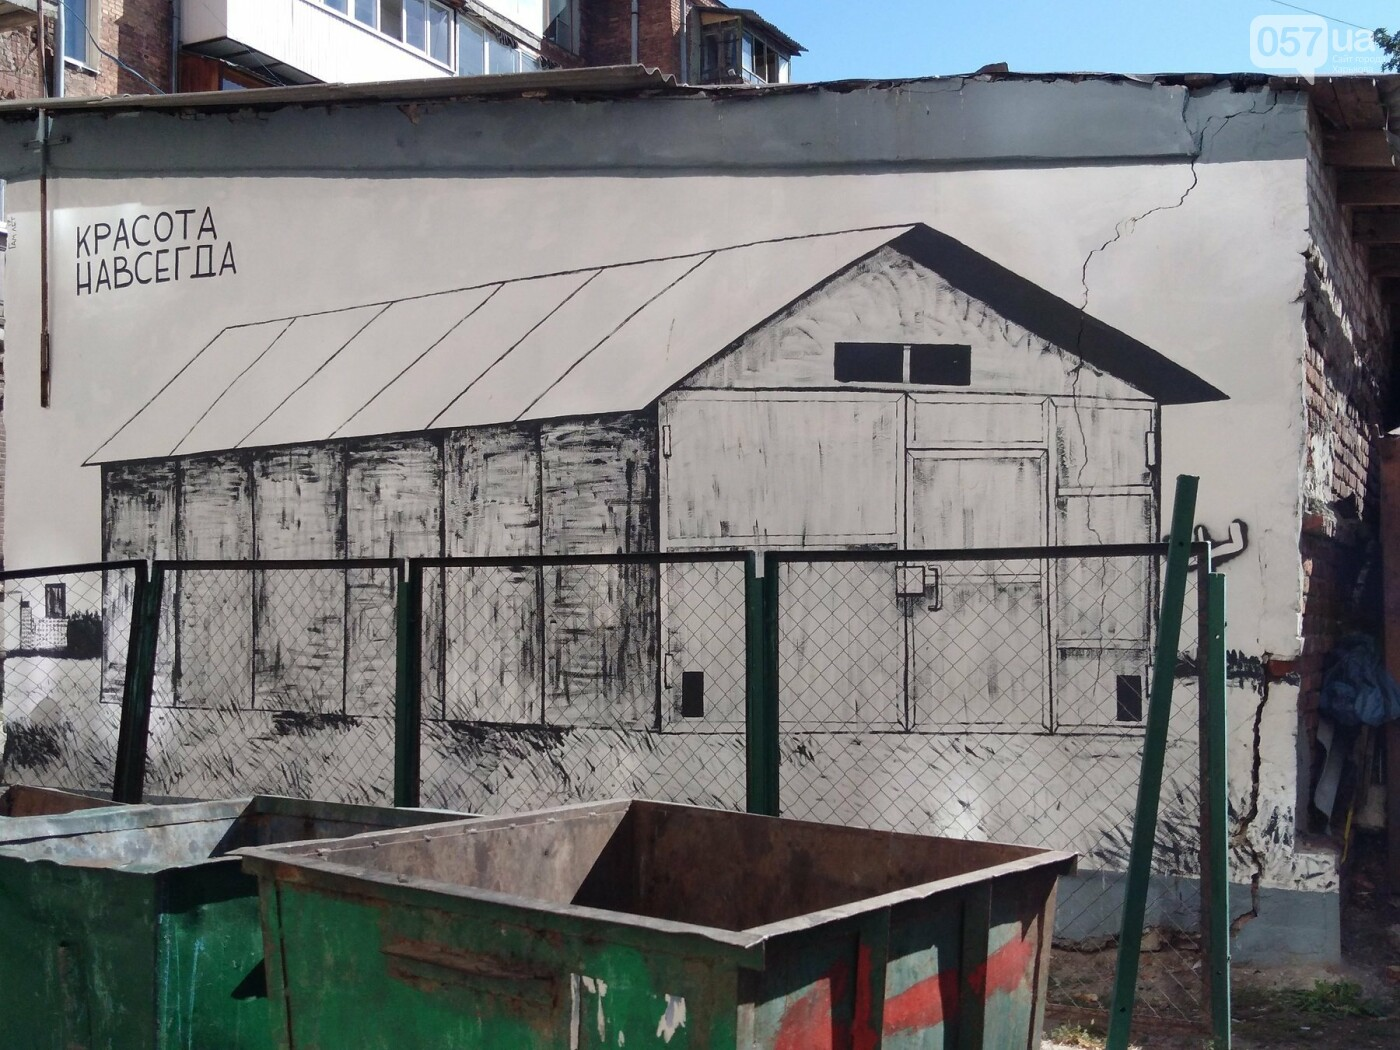 Стрит-арт Гамлета в Харькове: ТОП-10 граффити художника, - ФОТО, фото-2